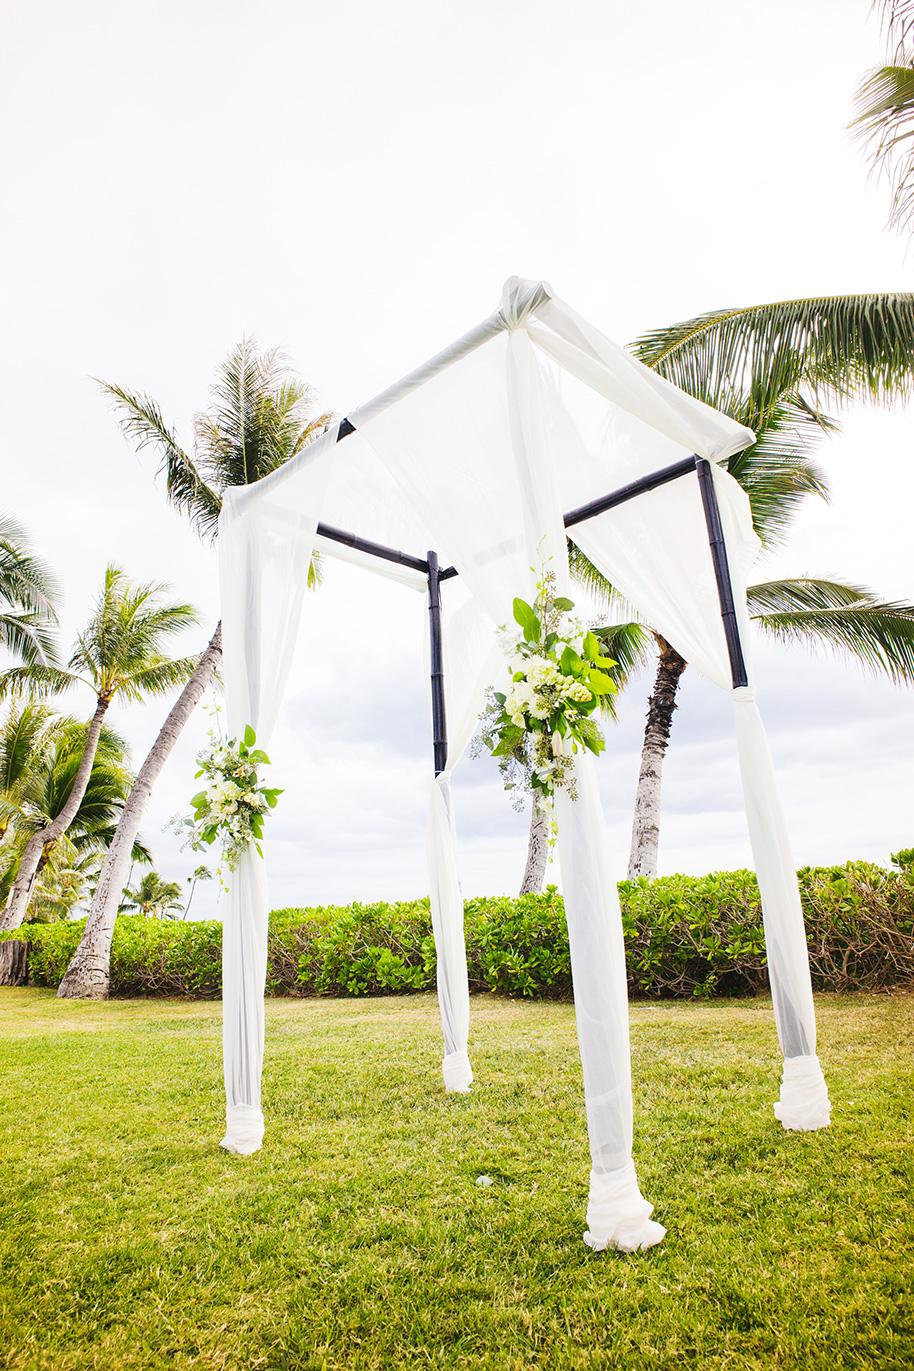 Paradise-Cove-Wedding-040816-12